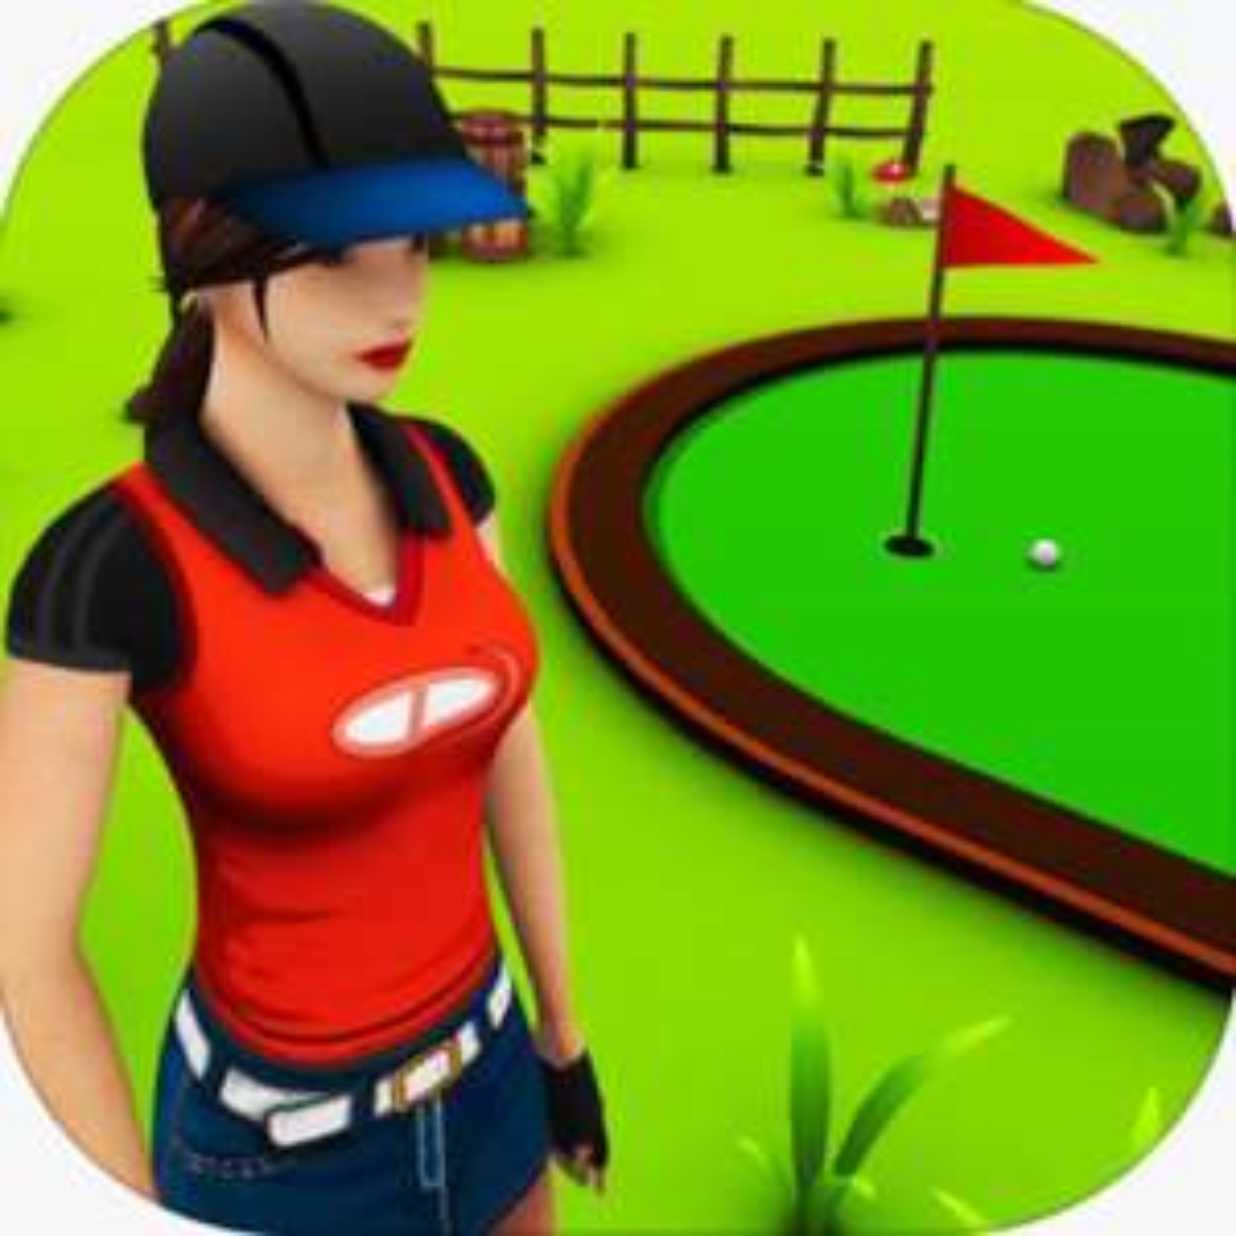 [iOS] Mini Golf Game 3D Plus kostenlos statt 2,29€